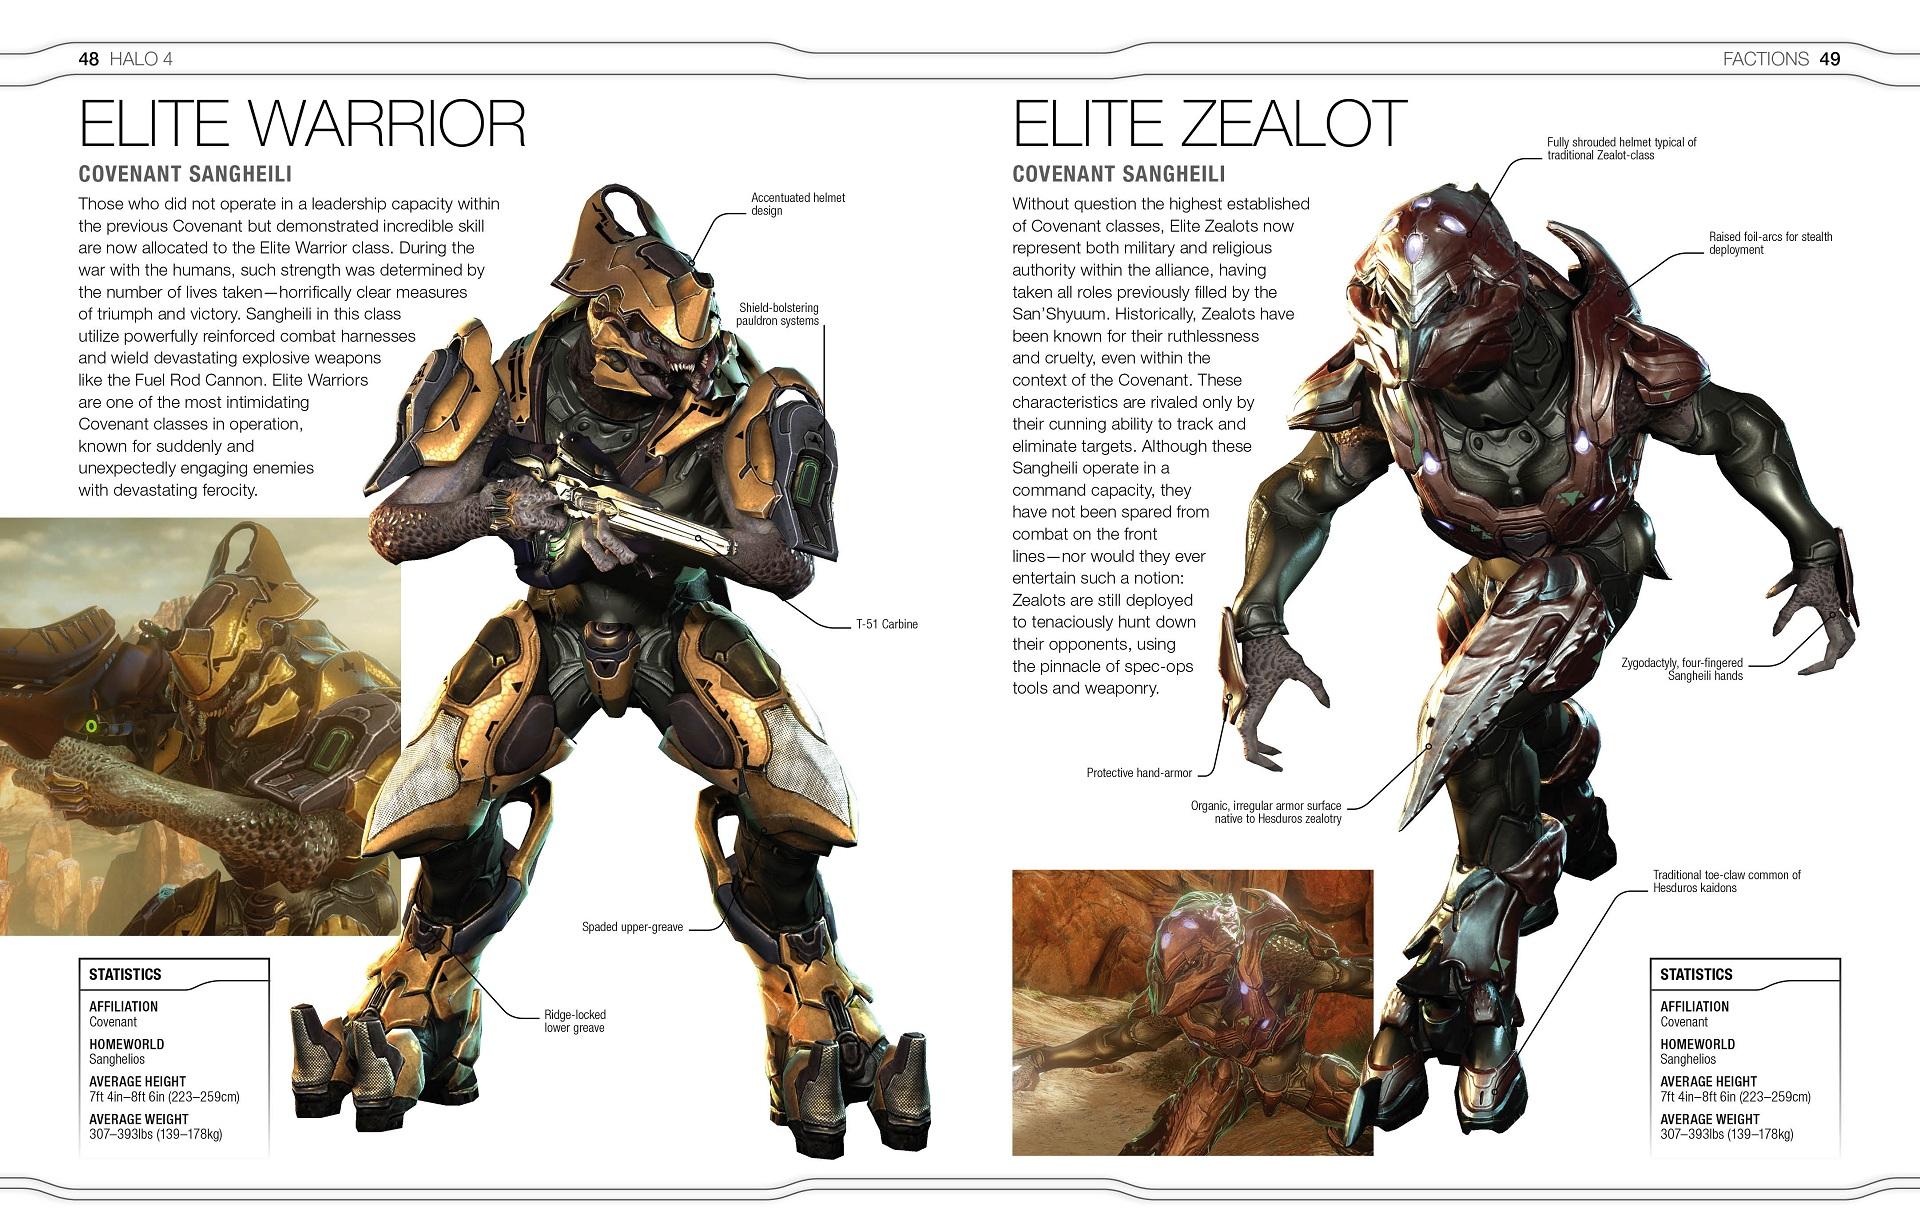 Halo 4 The Essential Visual Guide Halofanforlife